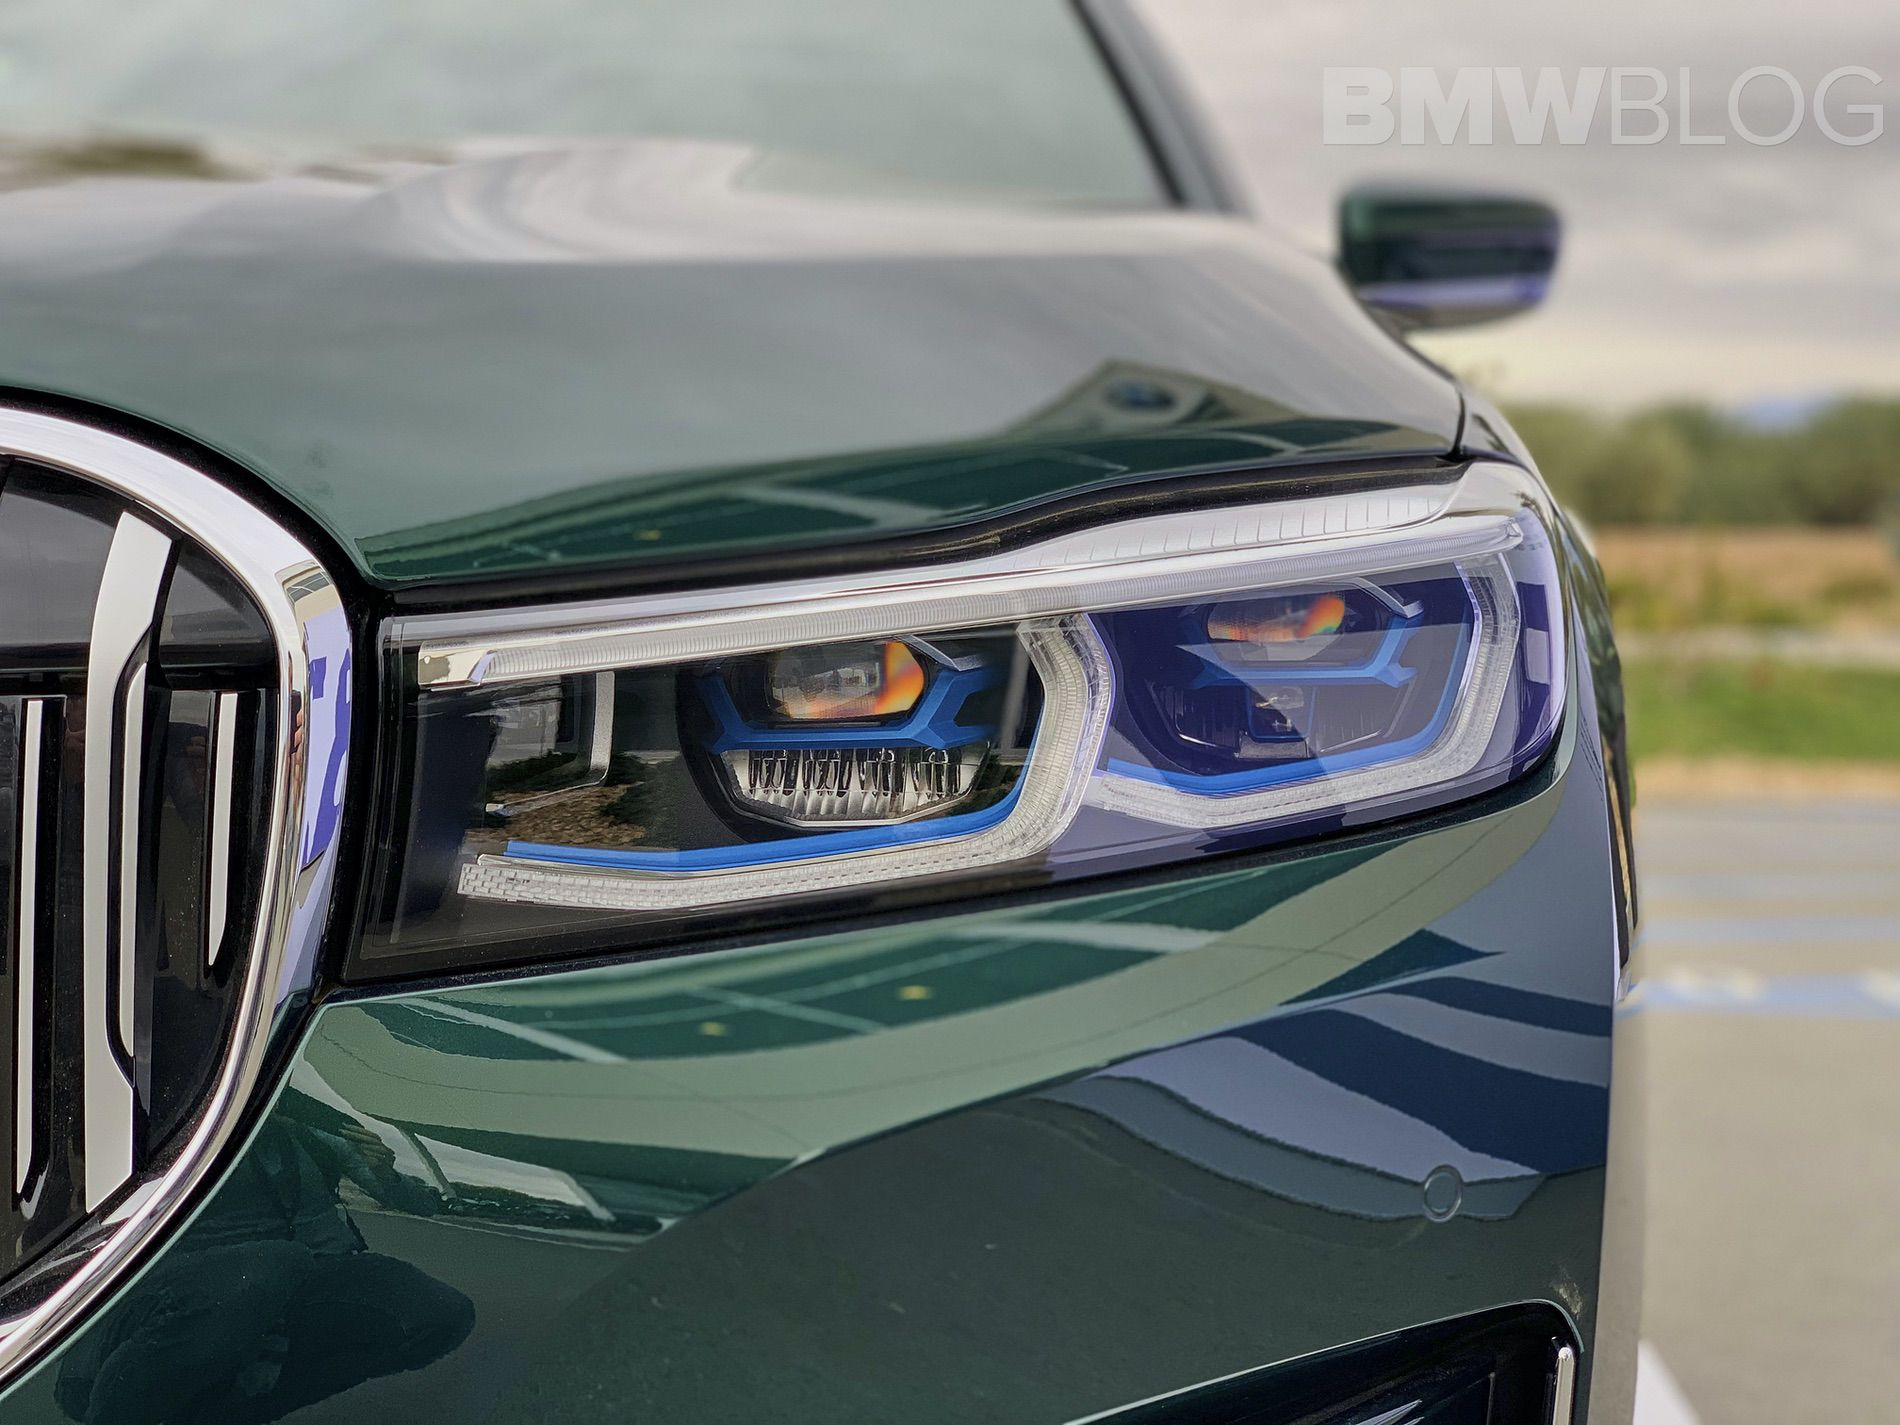 2019 - [BMW] Série 7 restylée  - Page 12 2020-ALPINA-B7-Facelift-01